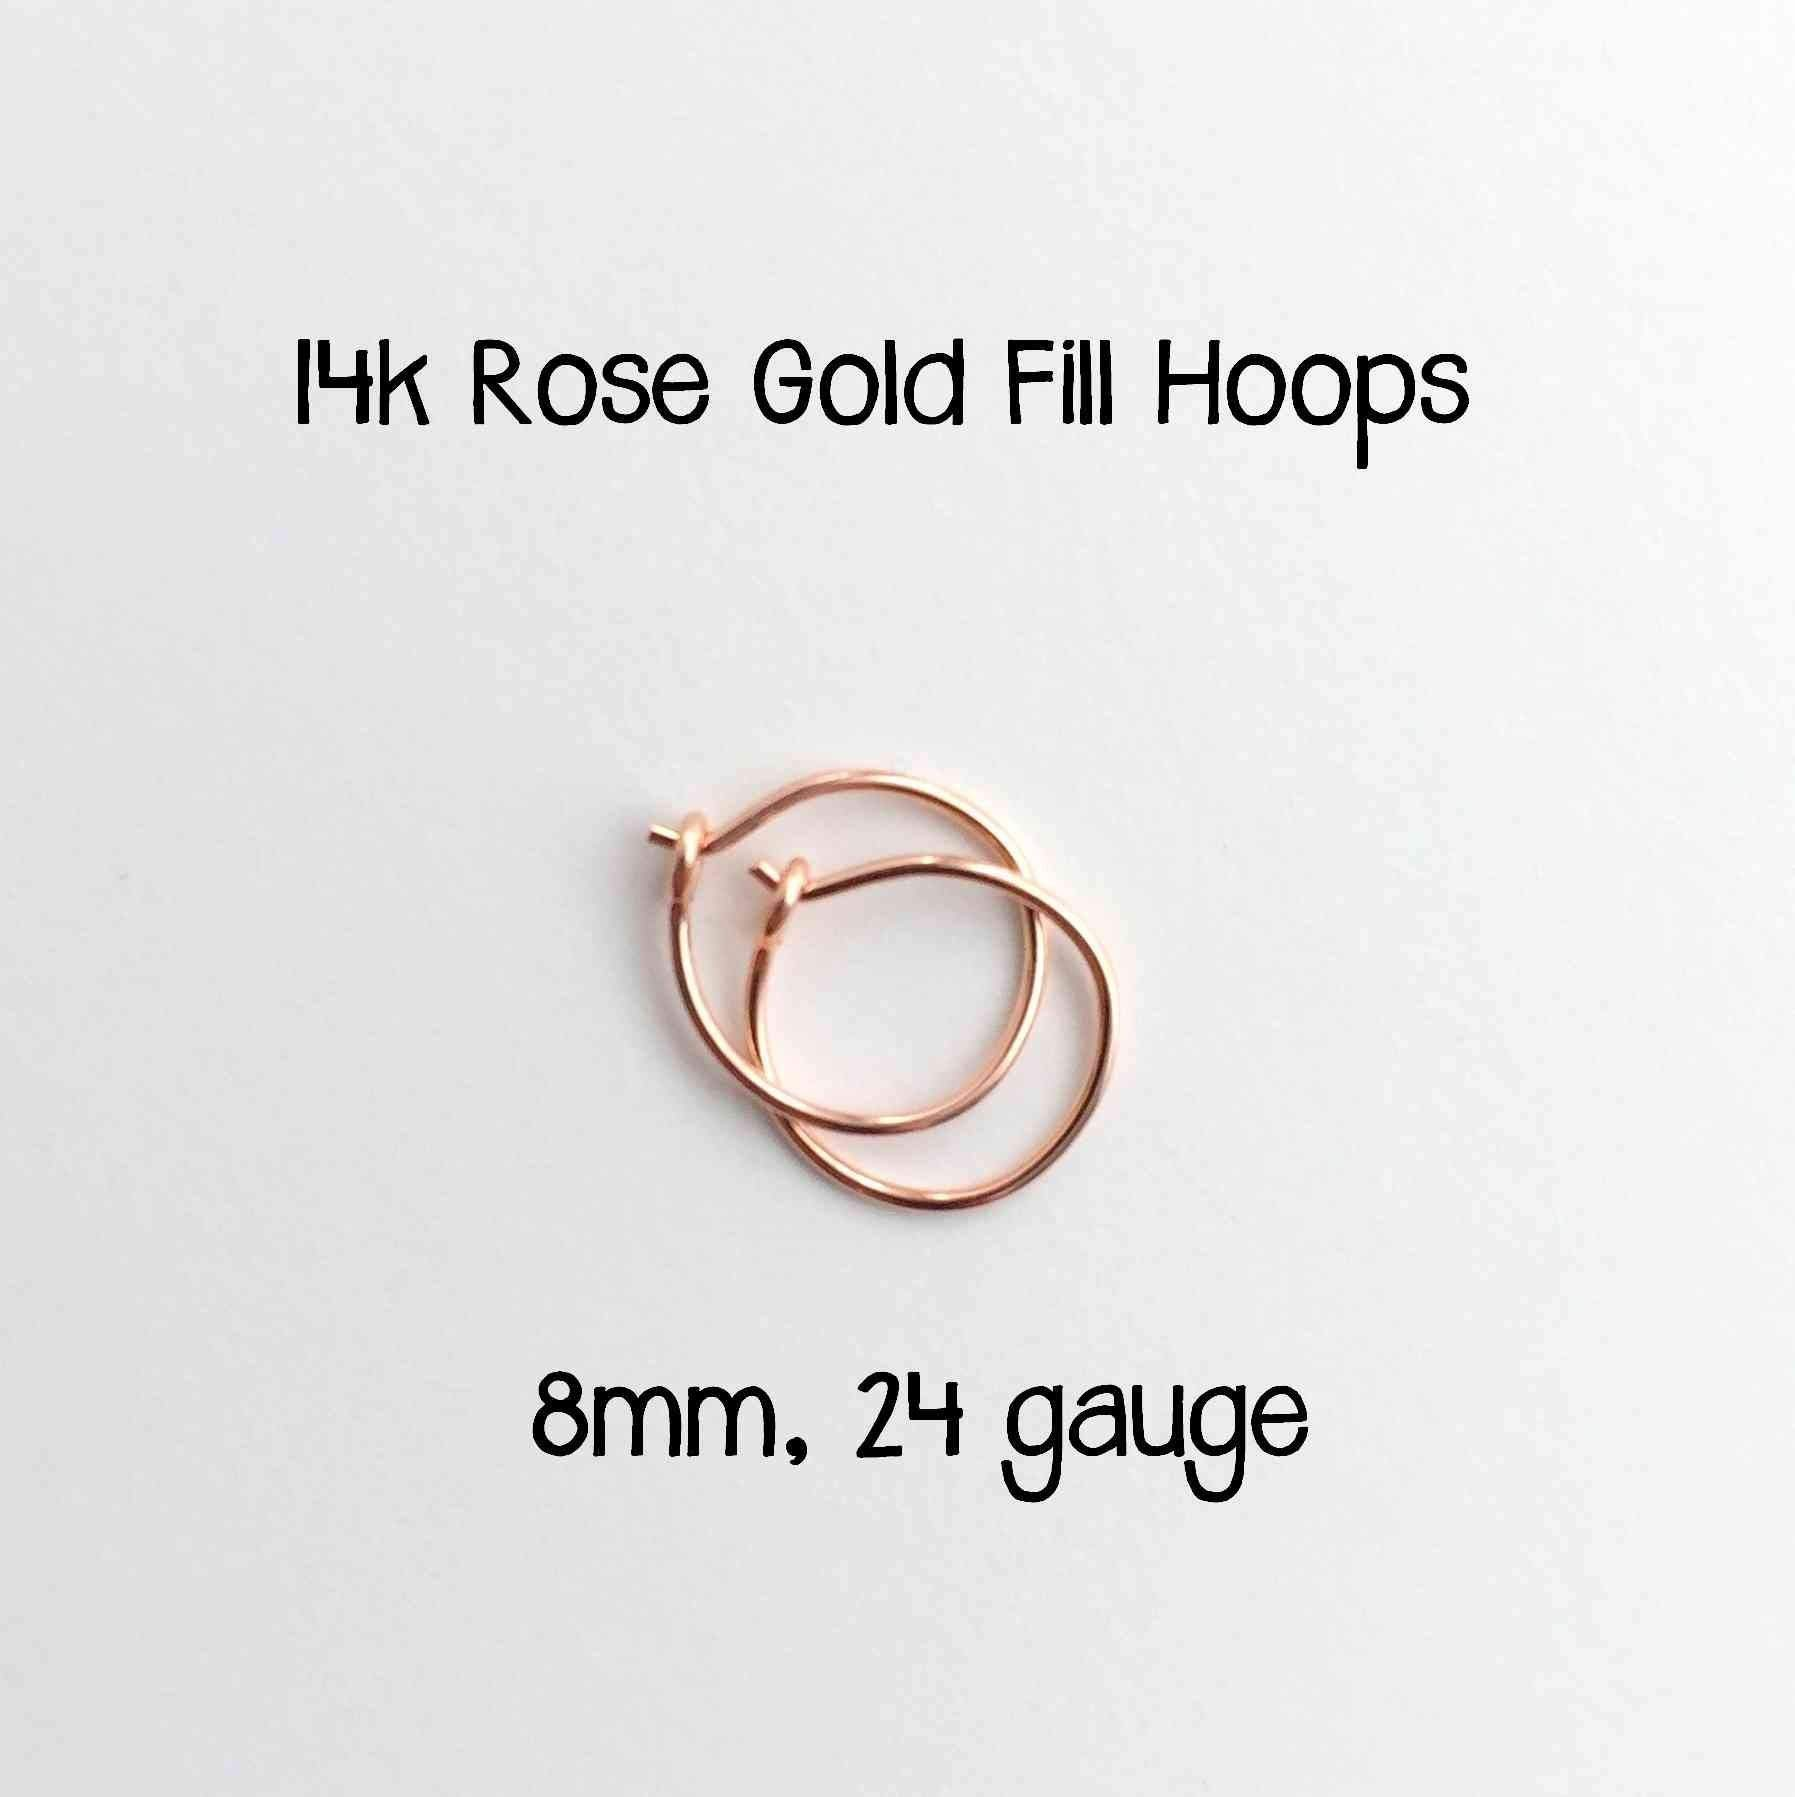 Sensitive Ears Earrings. 14k Rose Gold Fill Hoops 8mm, 24 gauge Handmade, Lightweight and Extra Thin